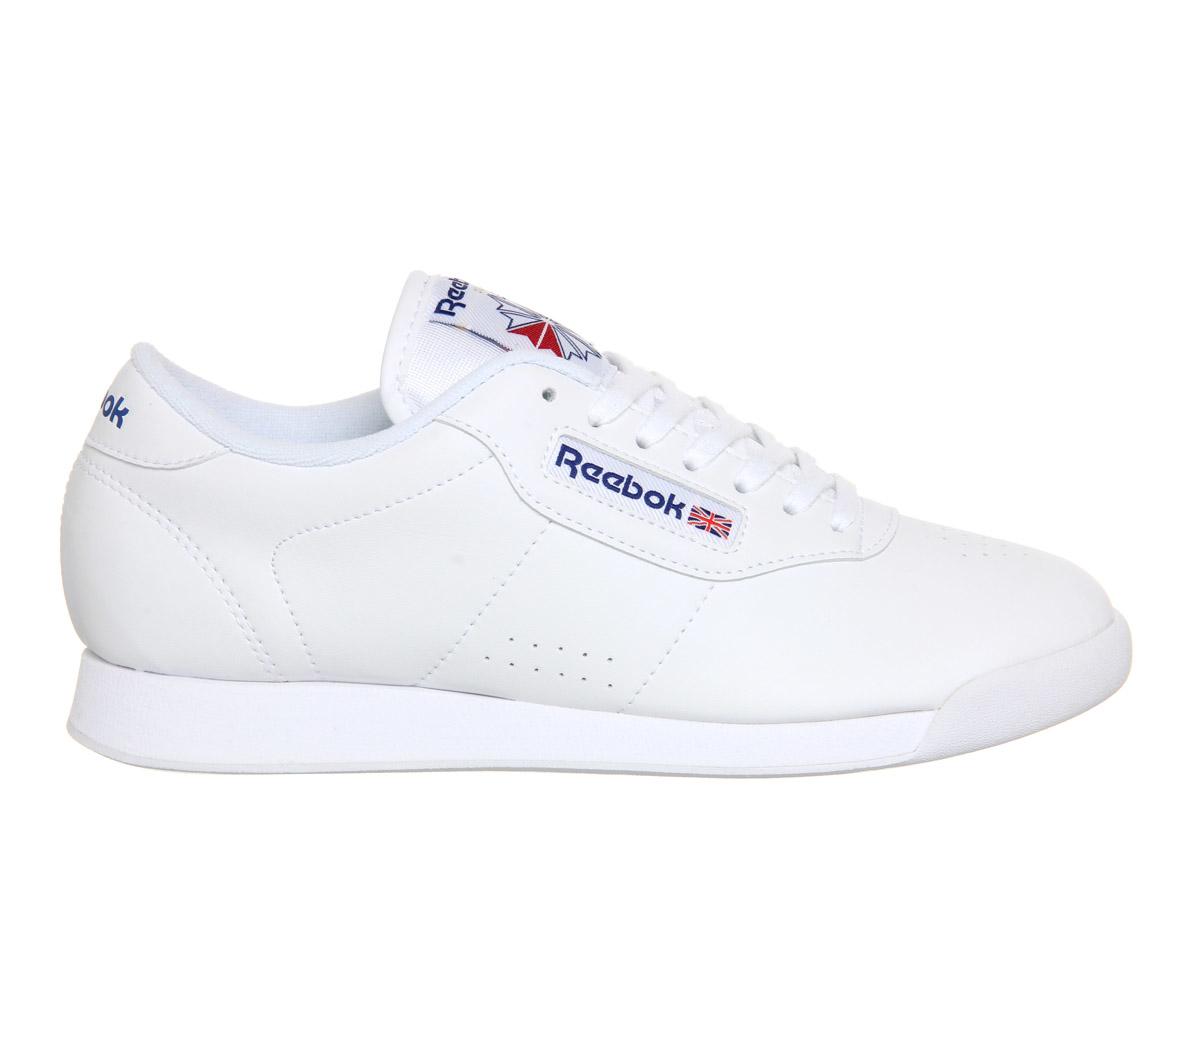 Reebok Mens Shoes Trainer White Sale